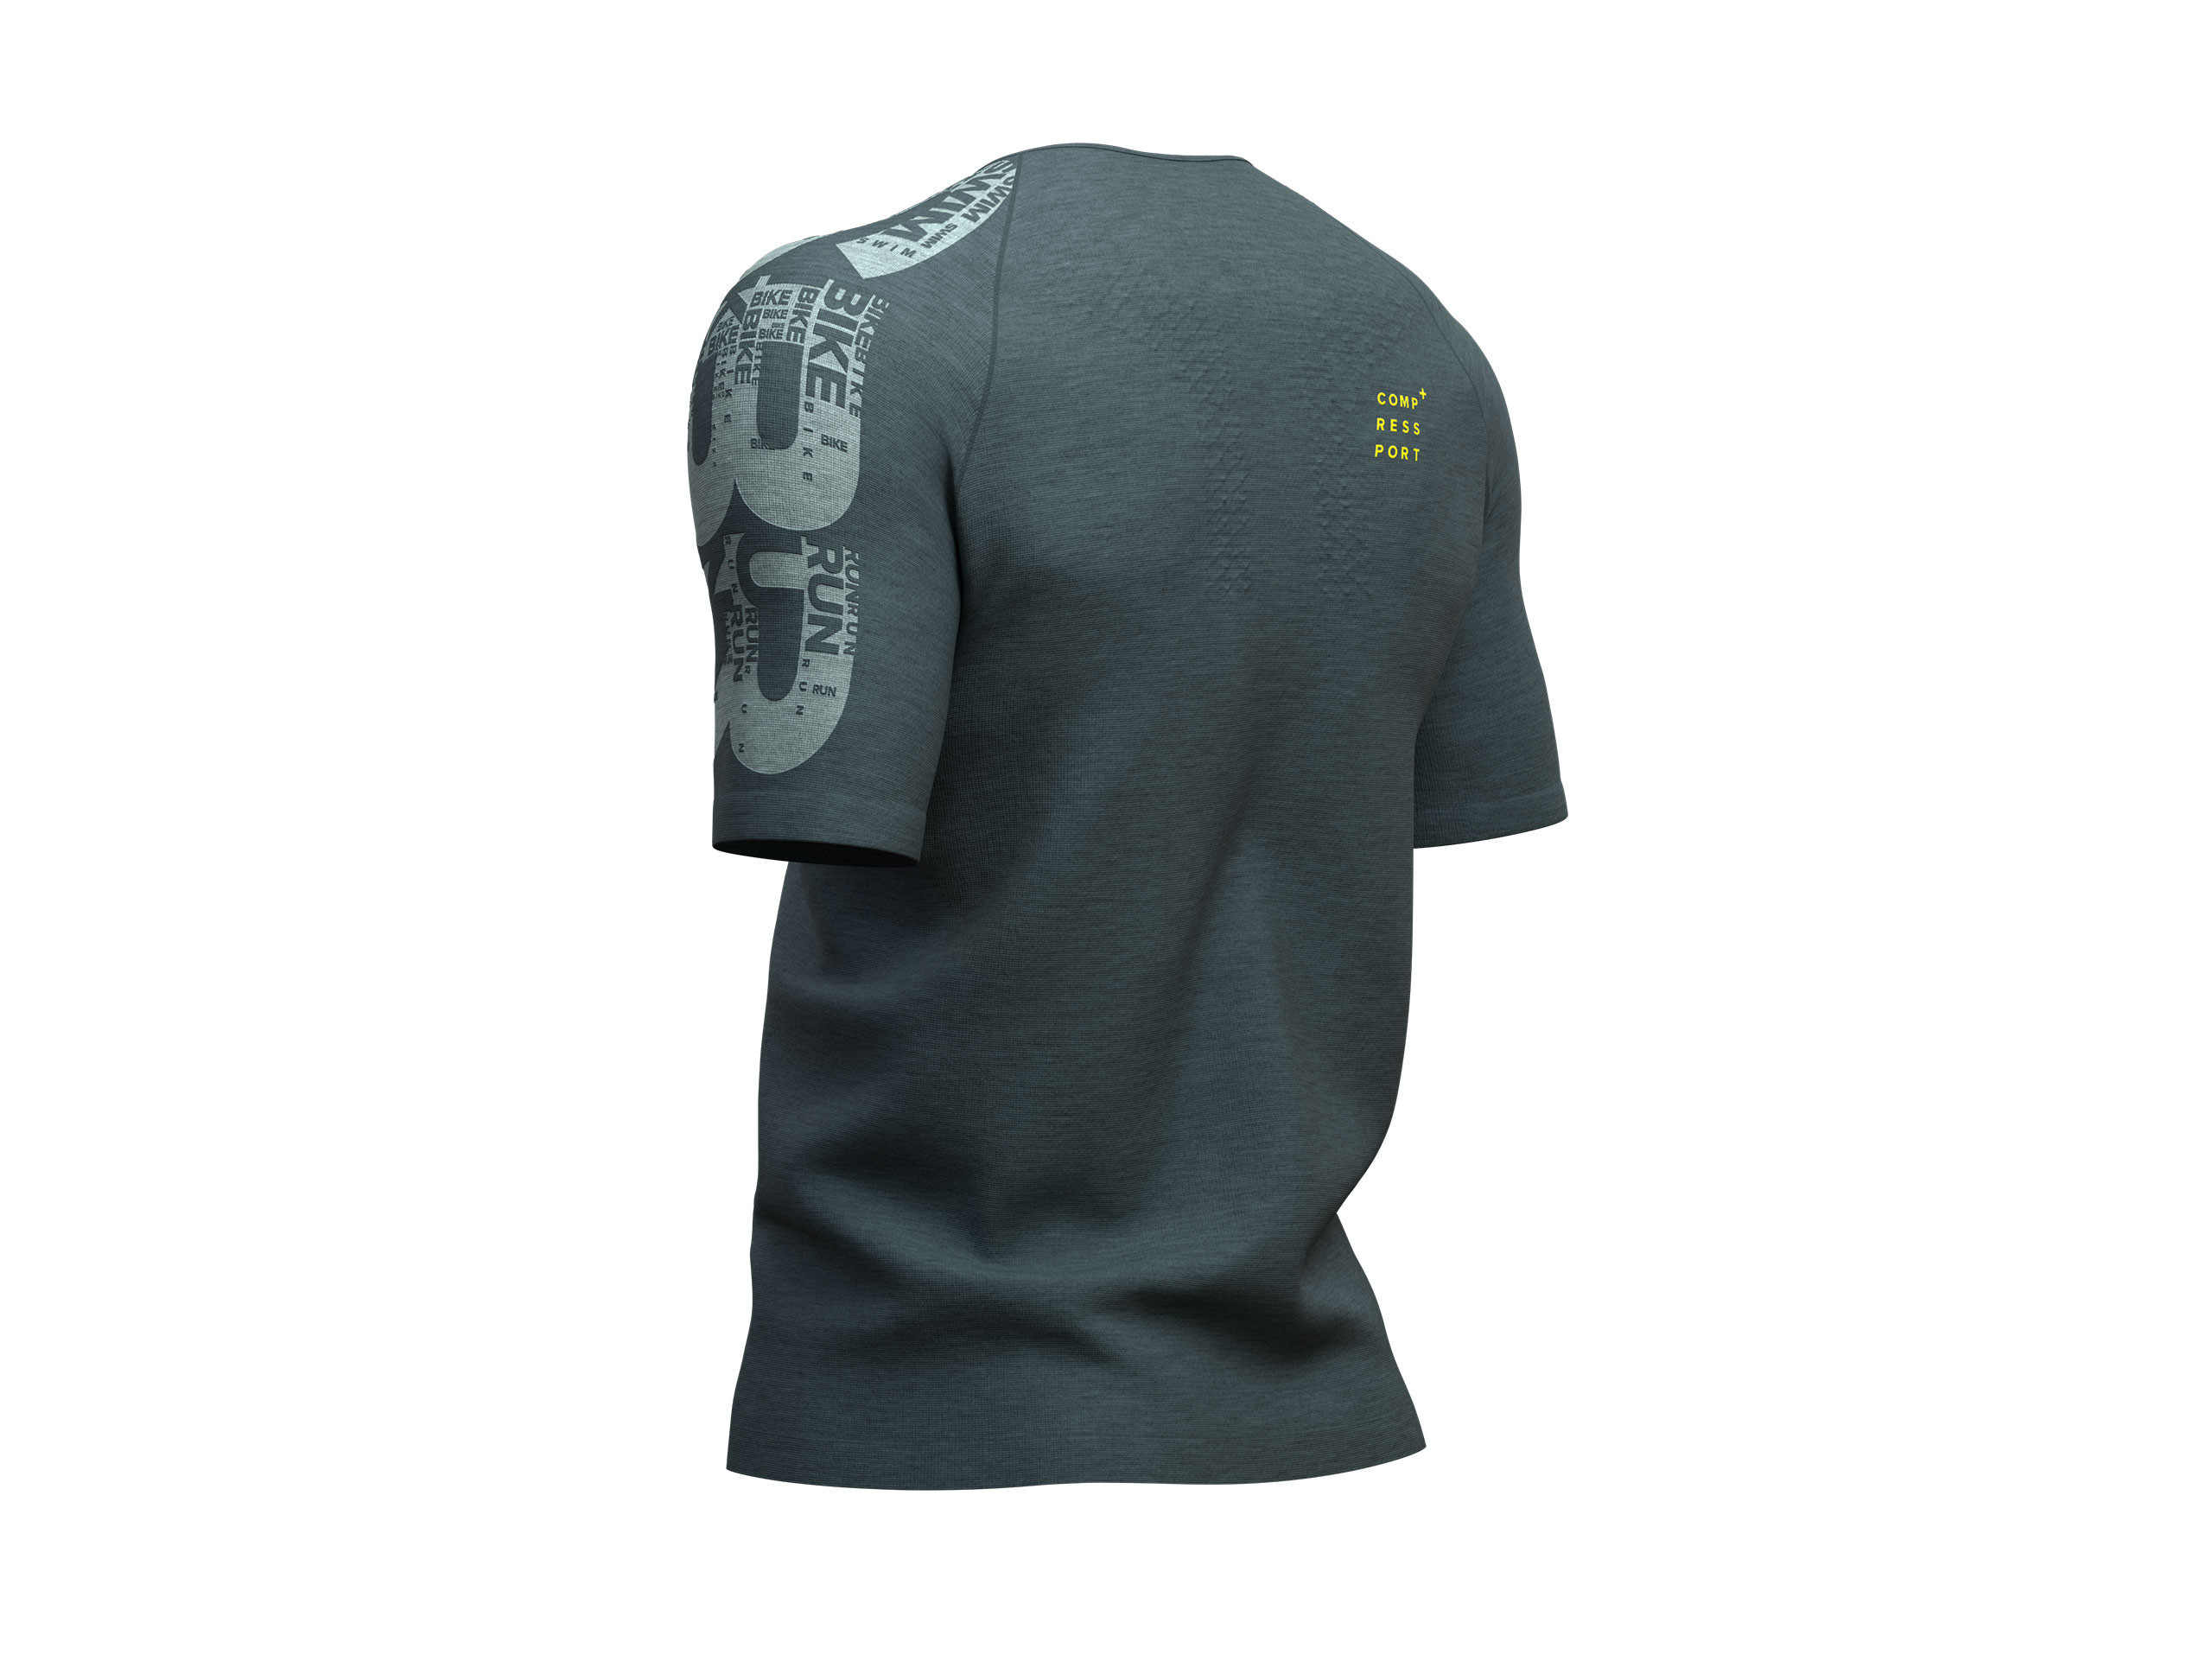 Camiseta de entrenamiento MC - Born To SwimBikeRun 2019